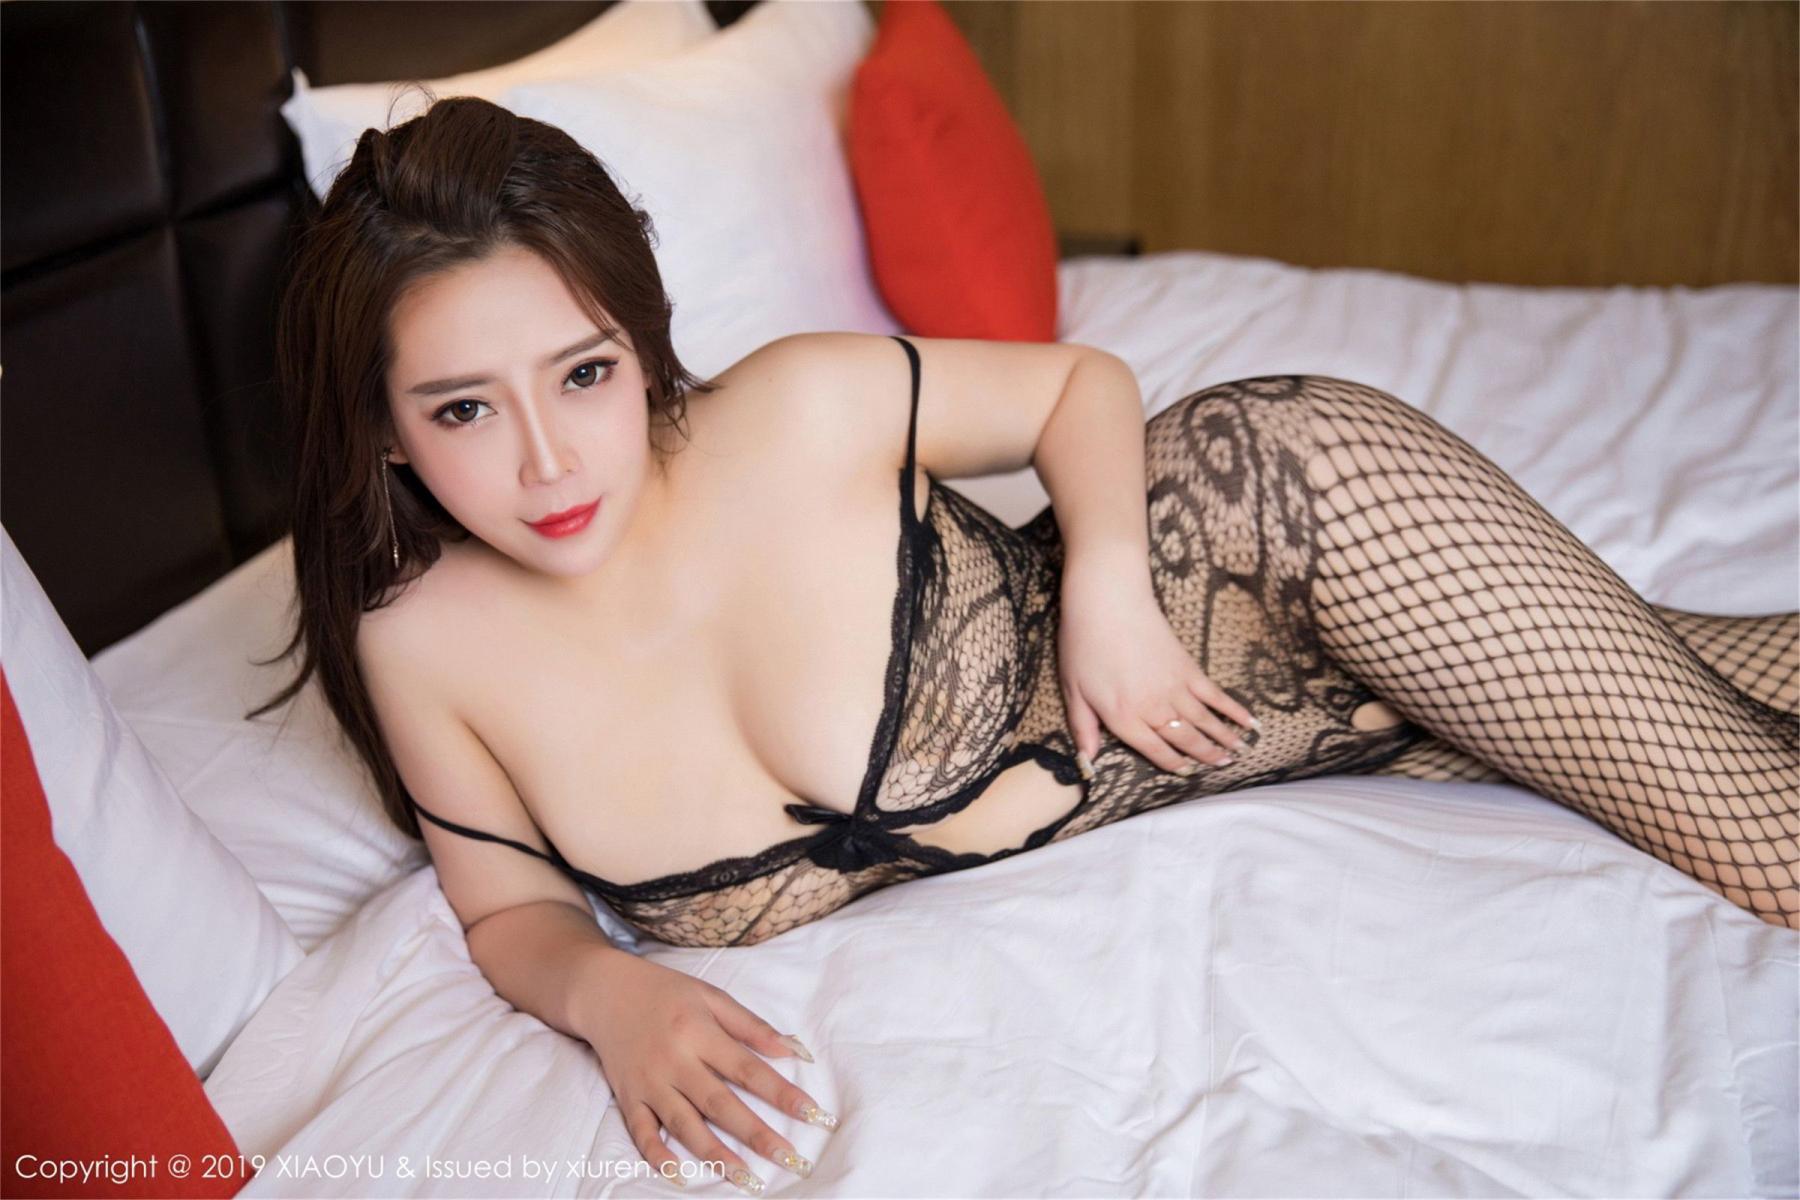 [XiaoYu] Vol.058 Miki Tu 40P, Miki Tu, XiaoYu